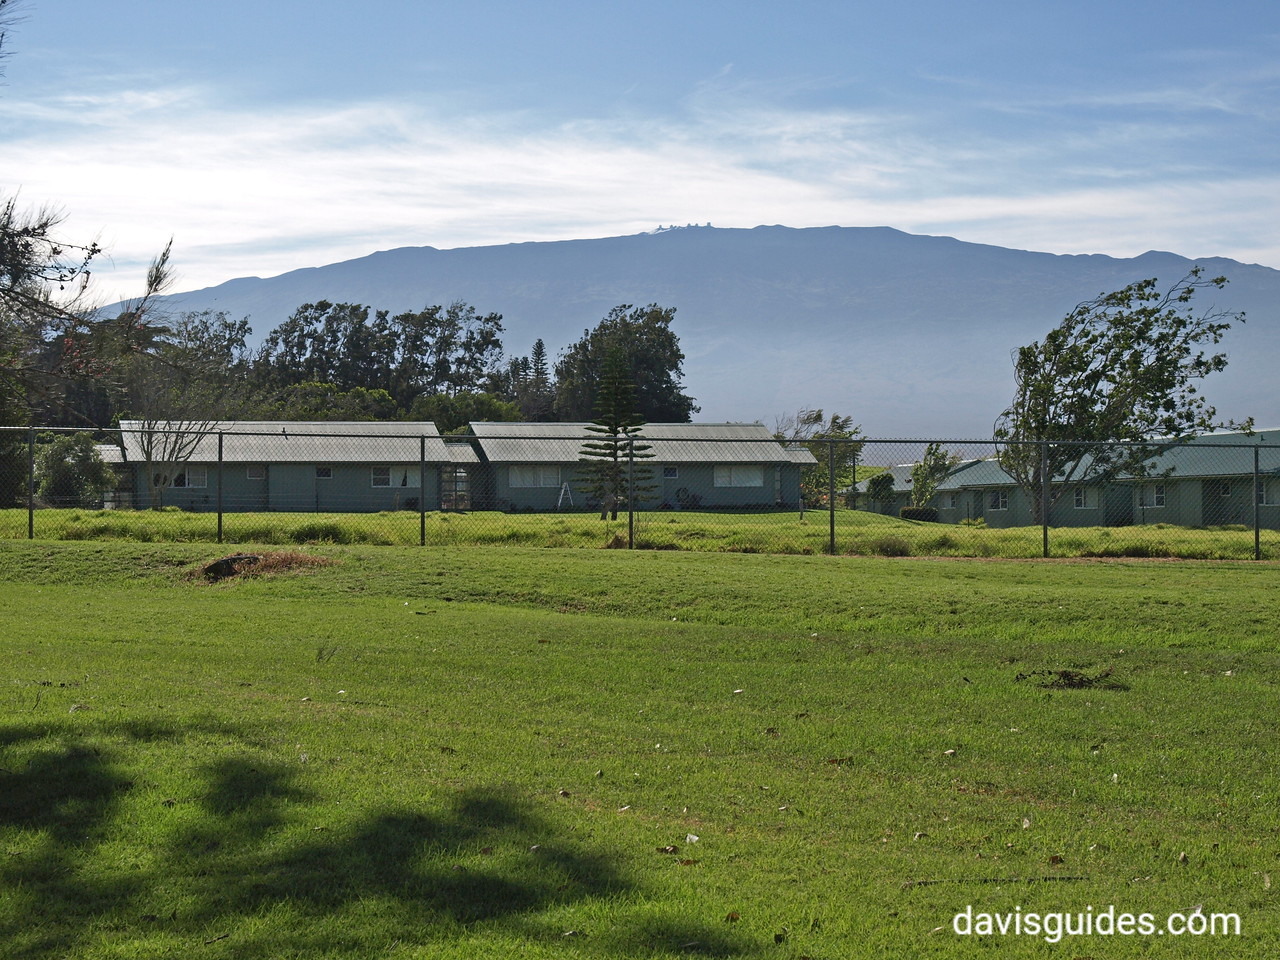 Mauna Kea summit from Waimea